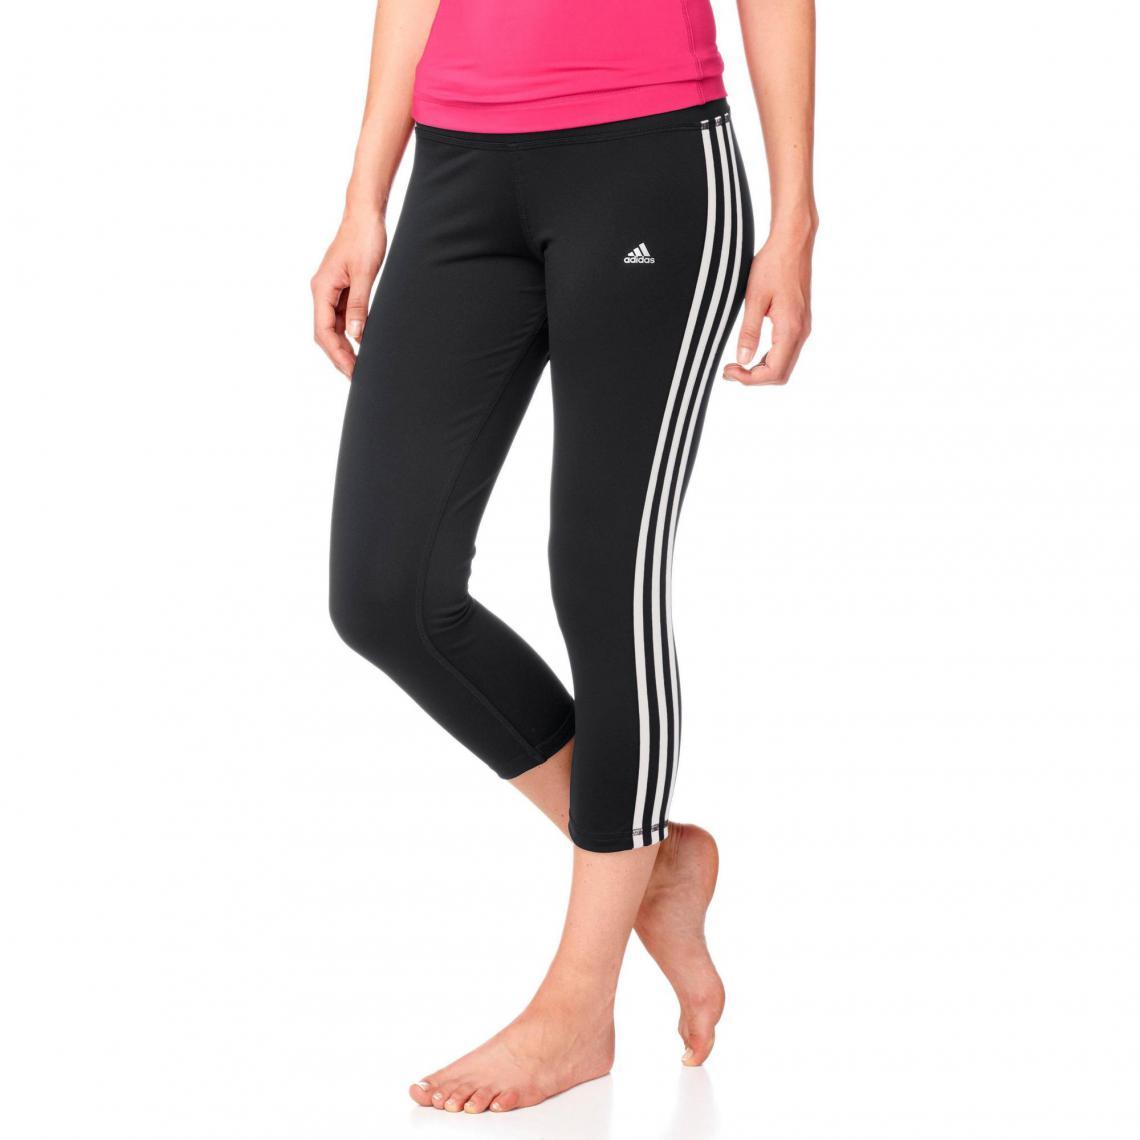 Pantalon legging 34 sport femme Climalite adidas - Noir Adidas Performance  Femme c9e495f8cf7